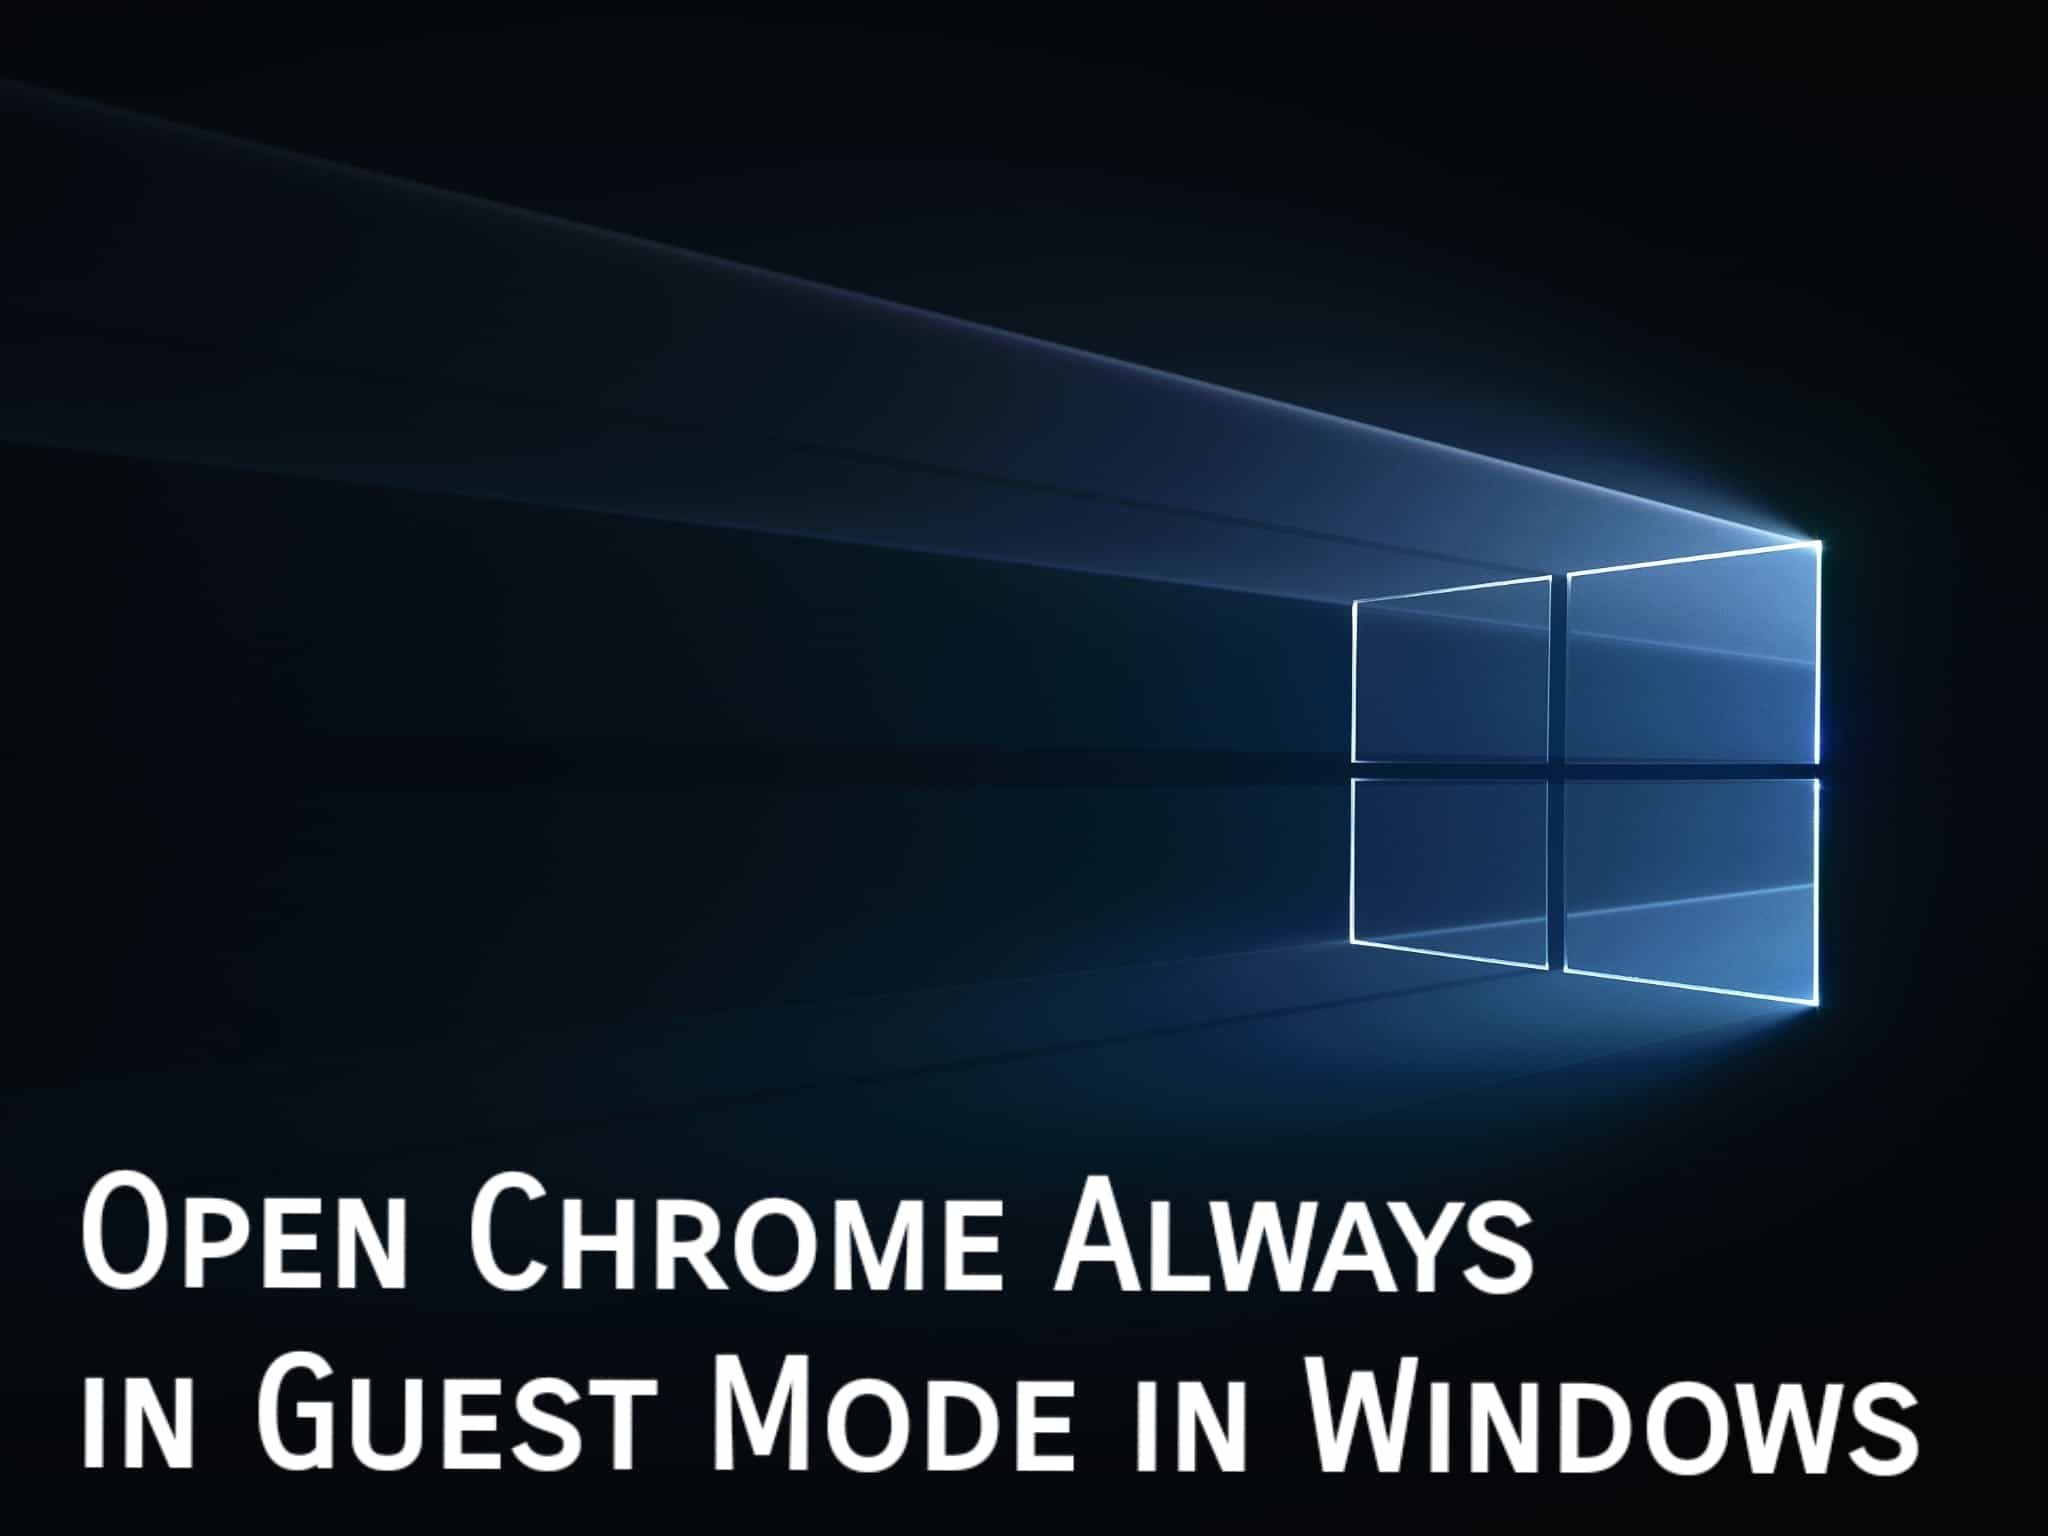 Open Chrome Always in Guest Mode in Windows